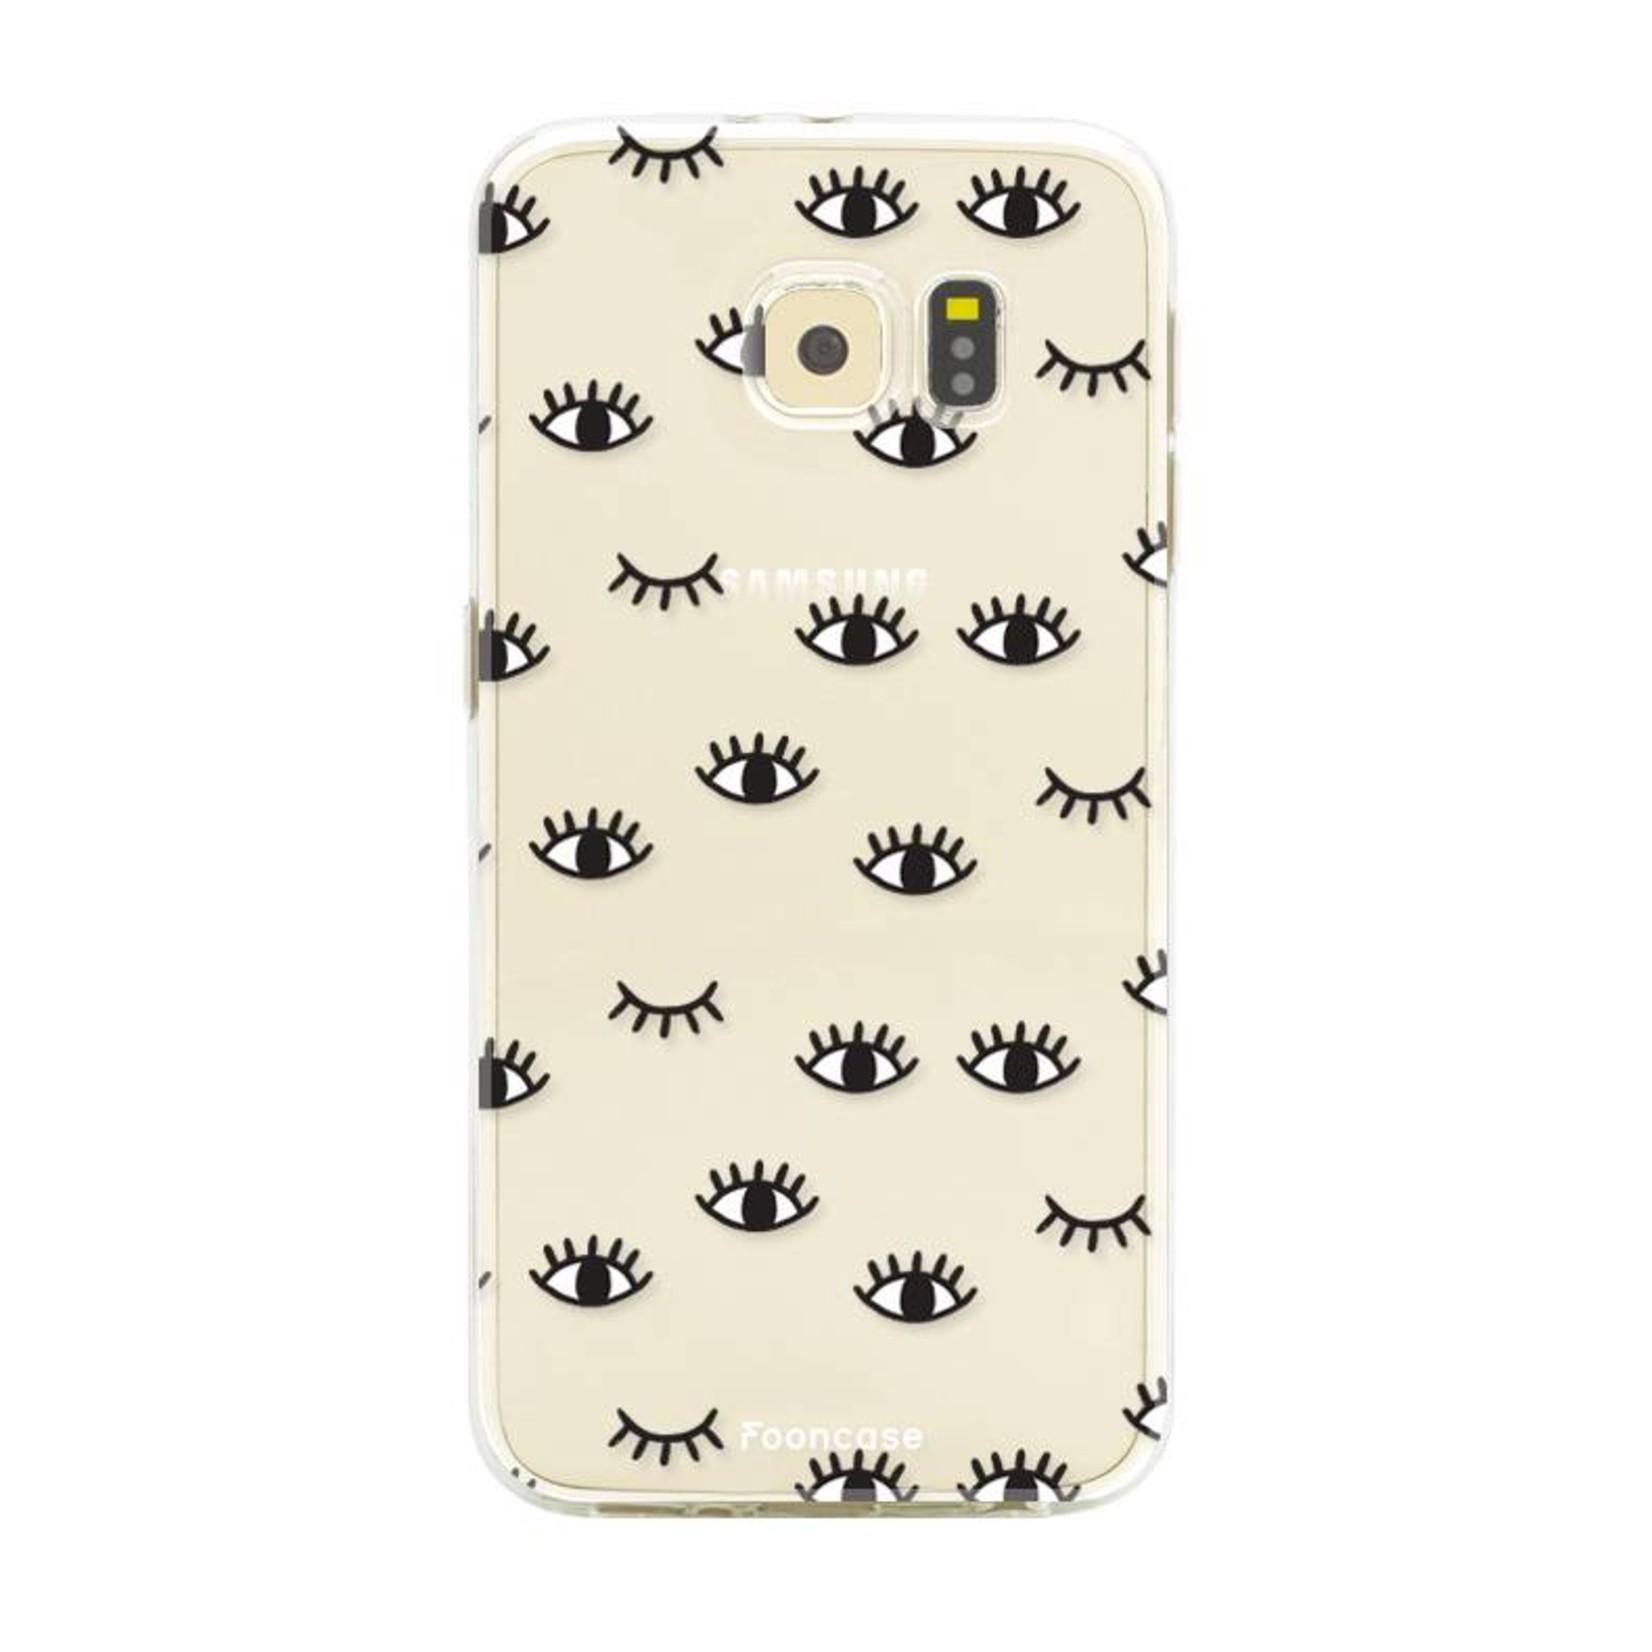 FOONCASE Samsung Galaxy S6 Edge Handyhülle - Eyes